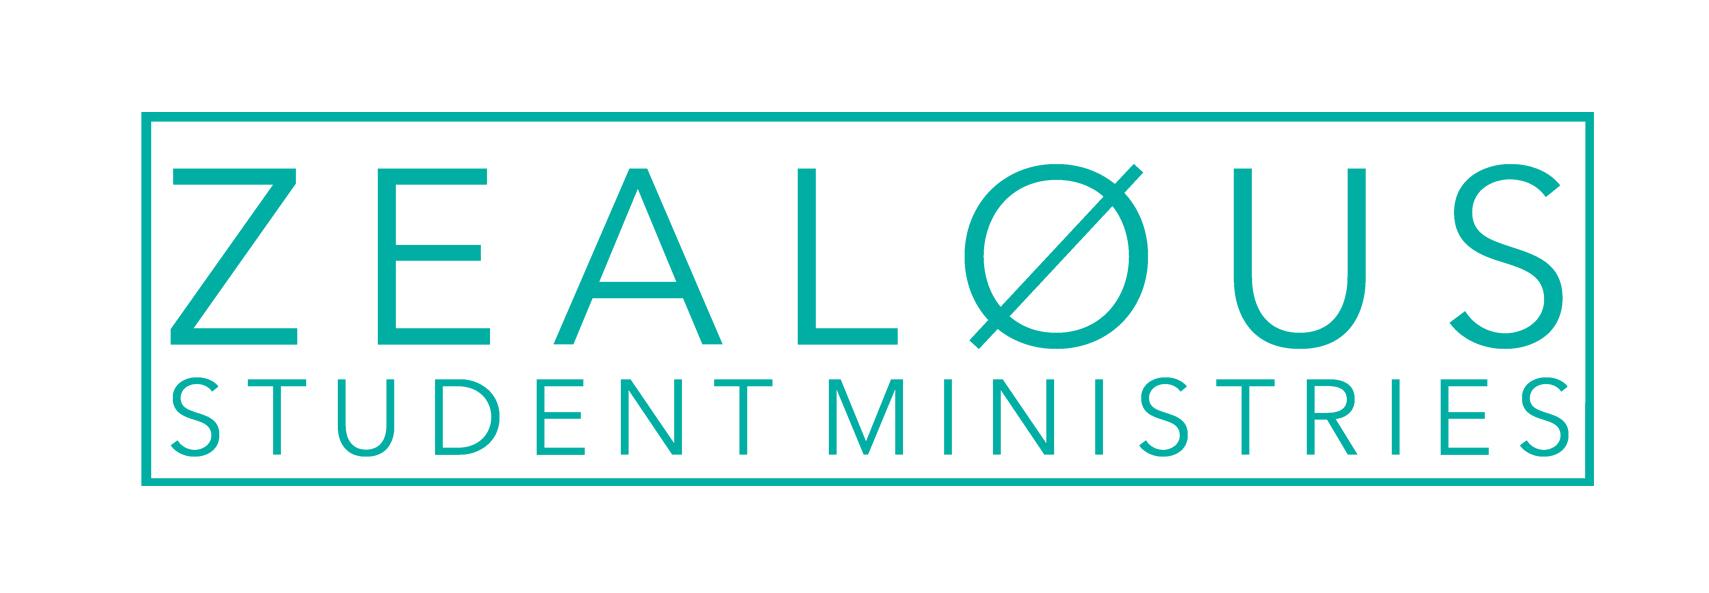 GRAPHIC_White_Zealous Student Ministries.jpg